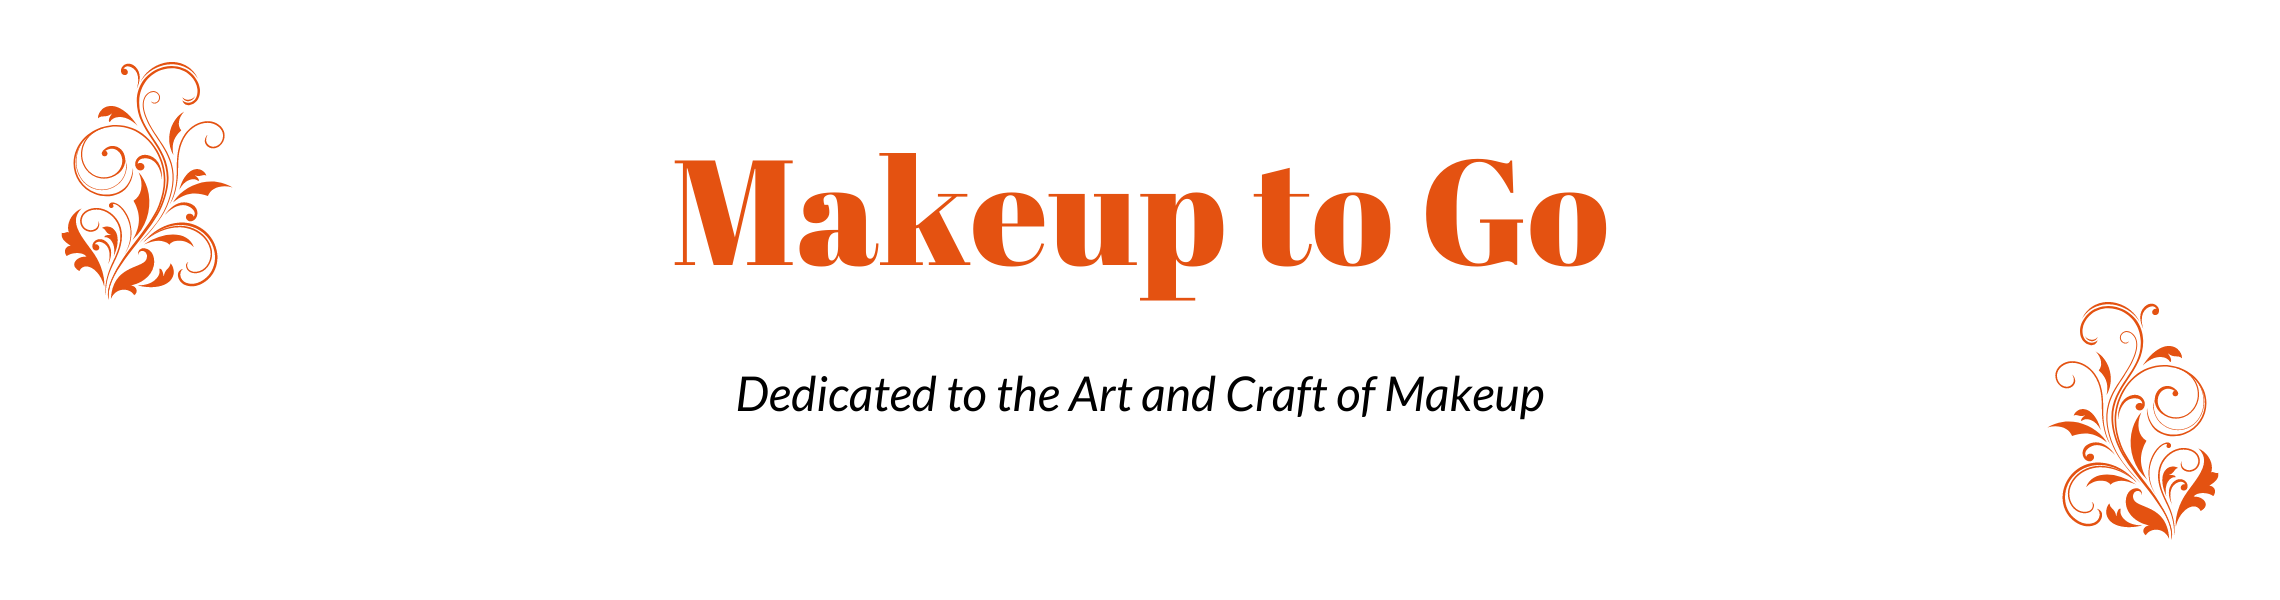 makeup to go blog tania d Russell makeup educator Los Angeles San Francisco